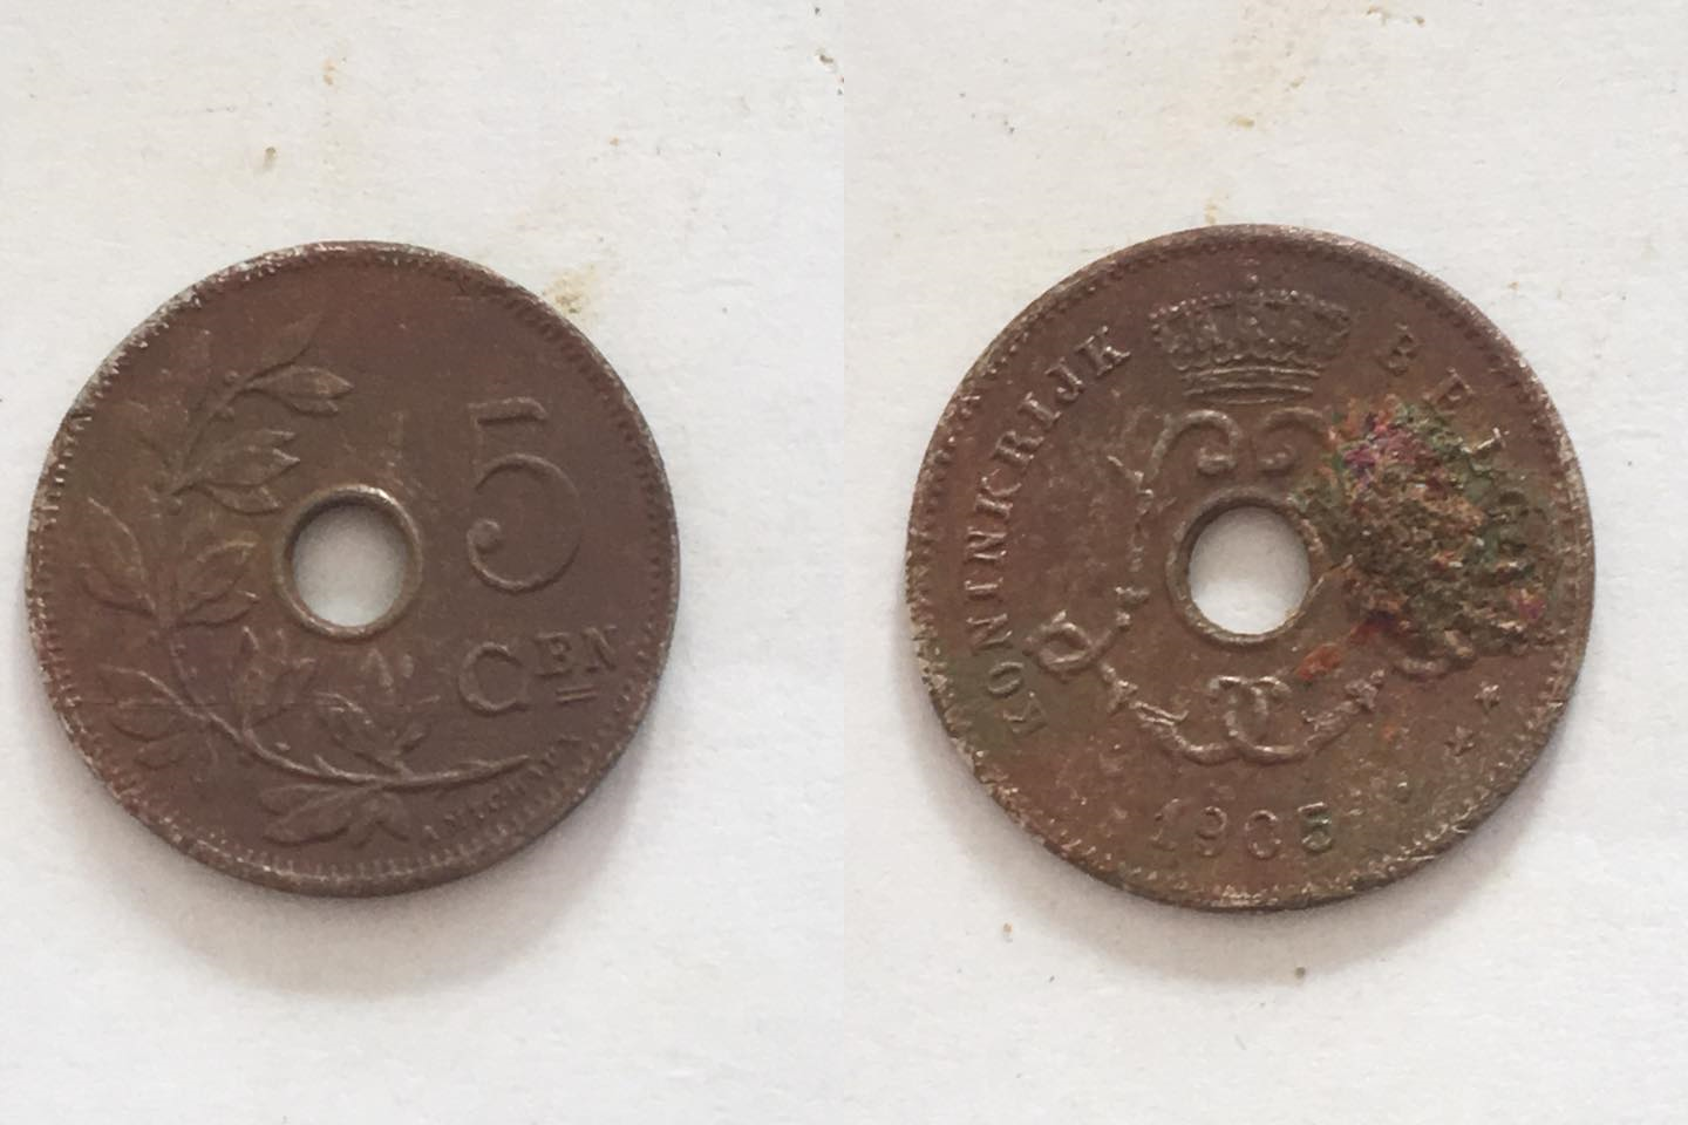 5 centiem